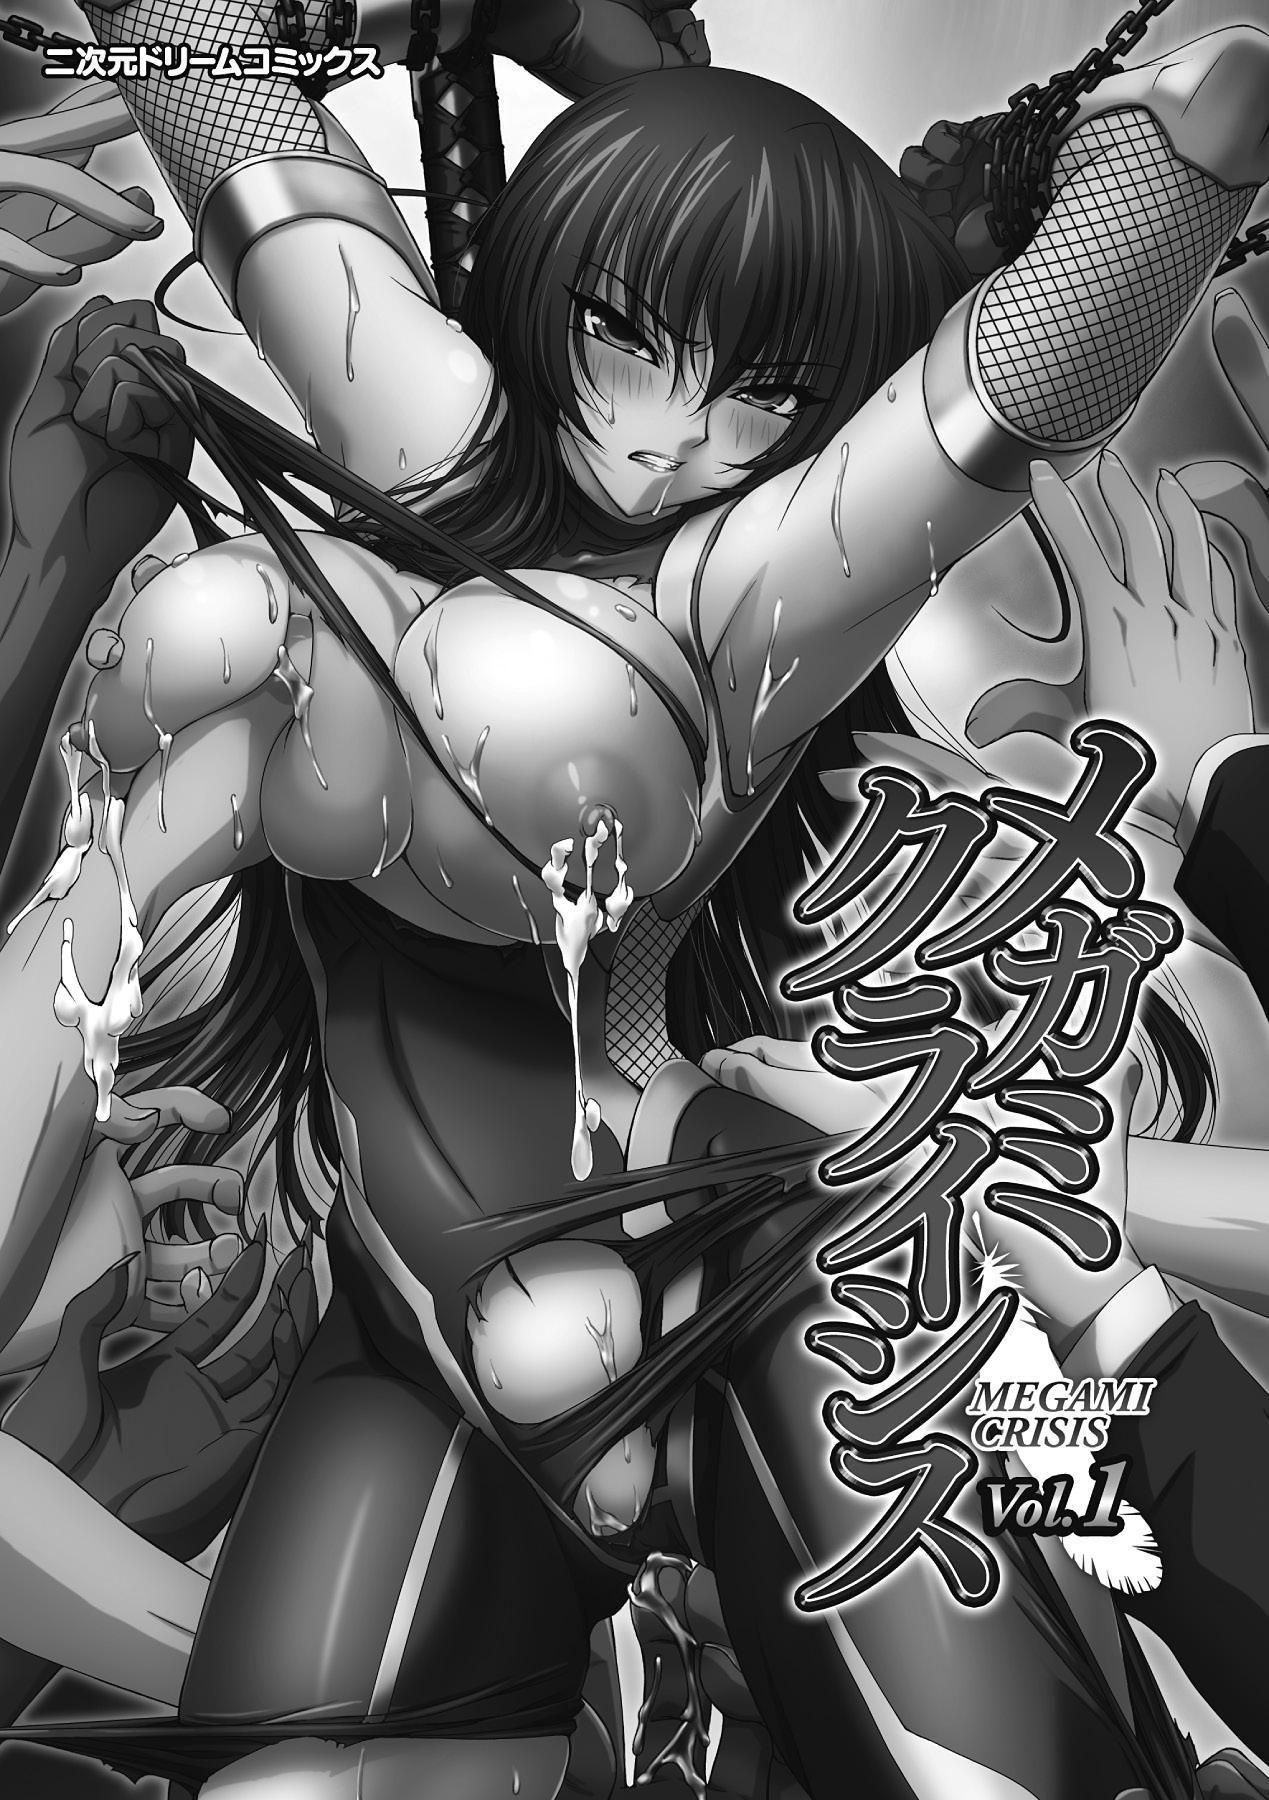 Megami Crisis 1 1